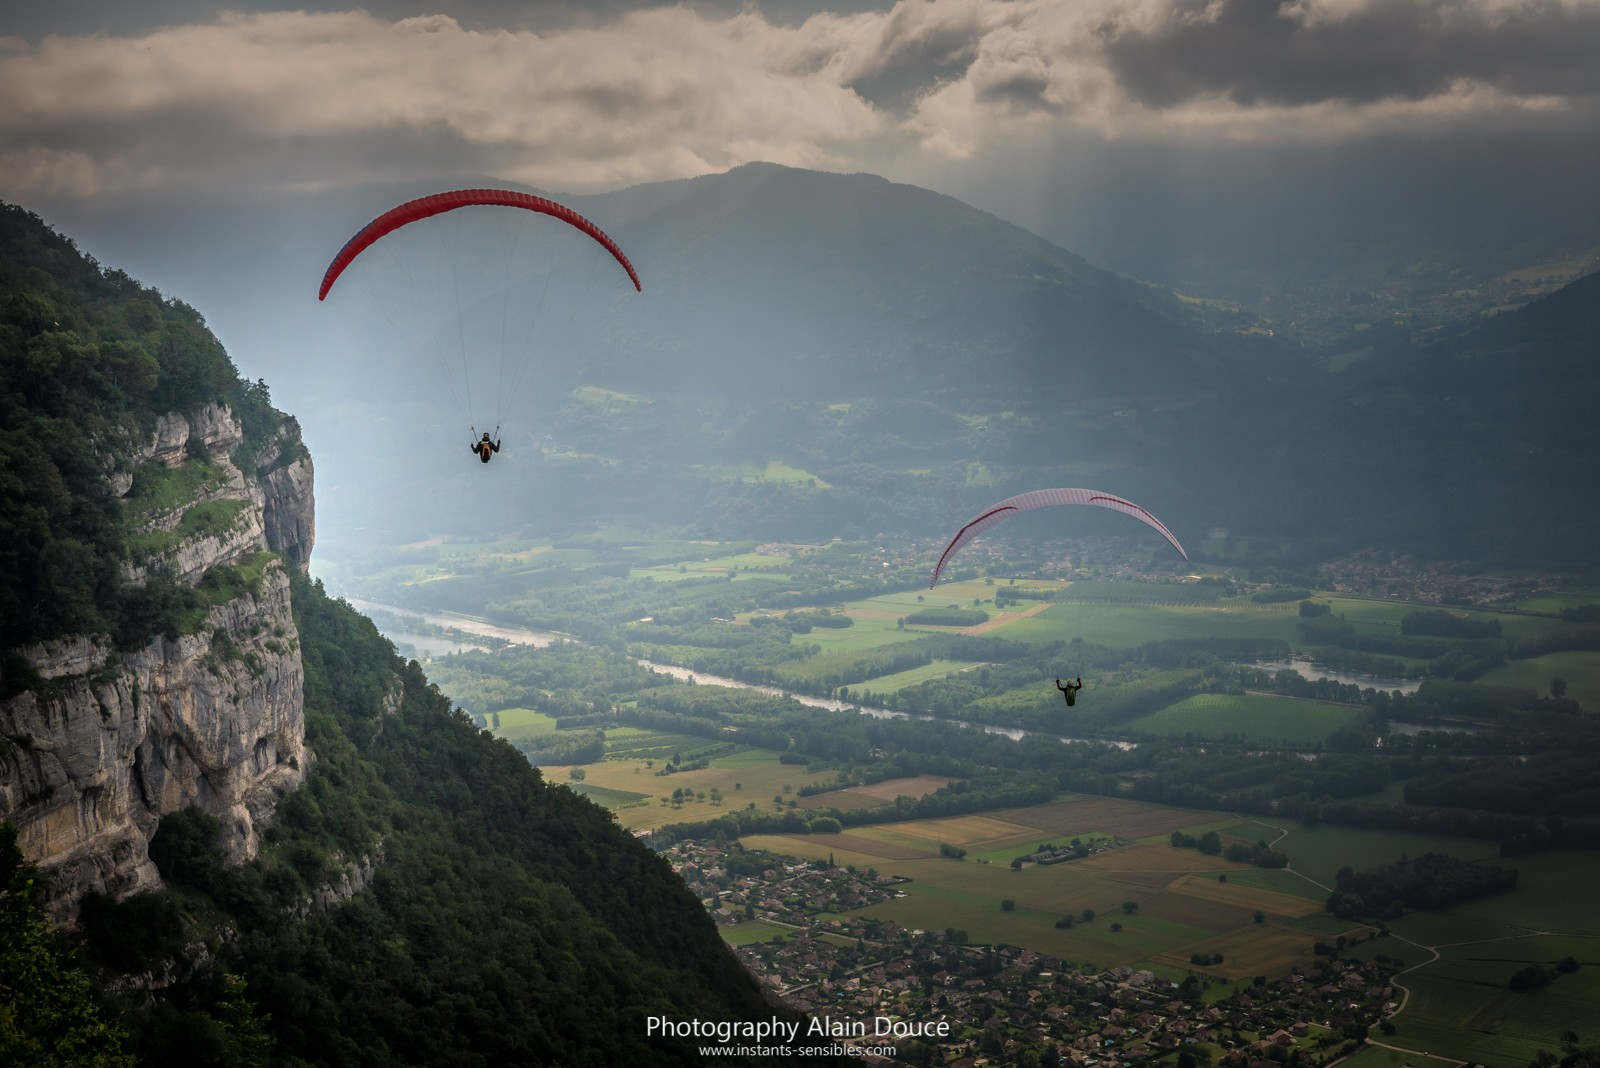 2018-06-14 Airtour2018 J5 BD Photo Alain Doucé-15